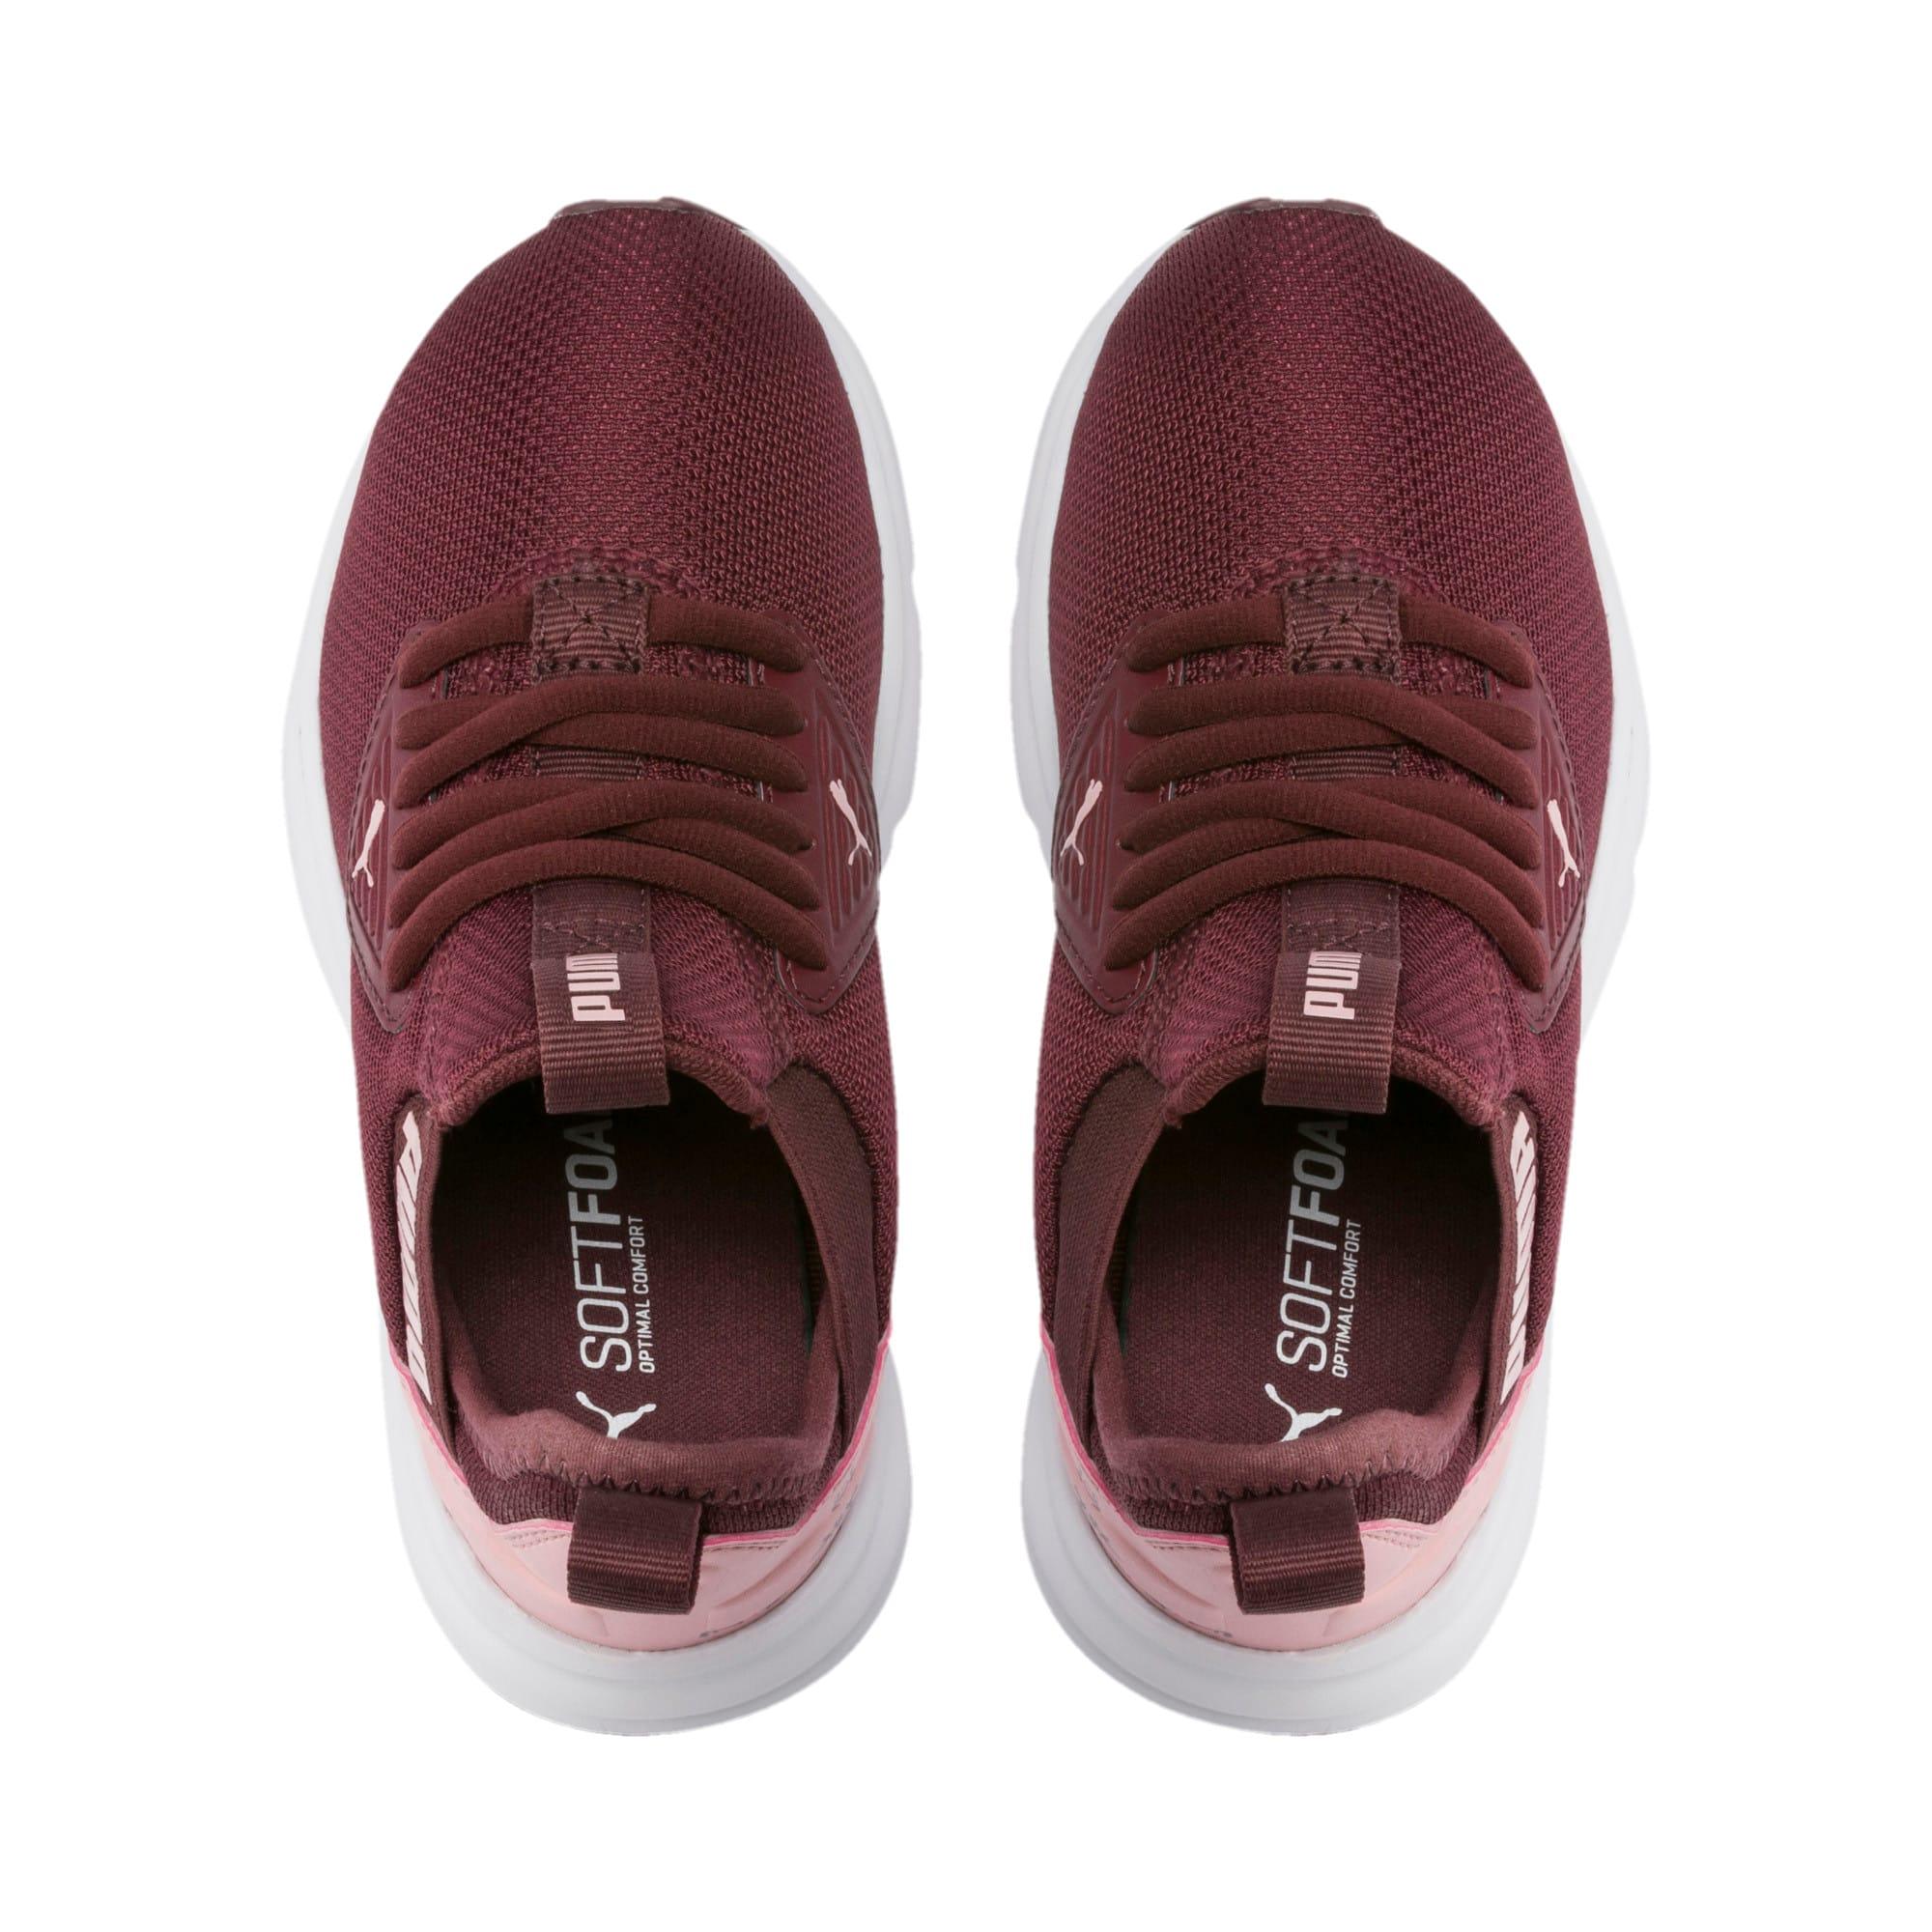 Thumbnail 6 of Enzo Beta Shine AC Sneakers PS, Vineyard Wine-Bridal Rose, medium